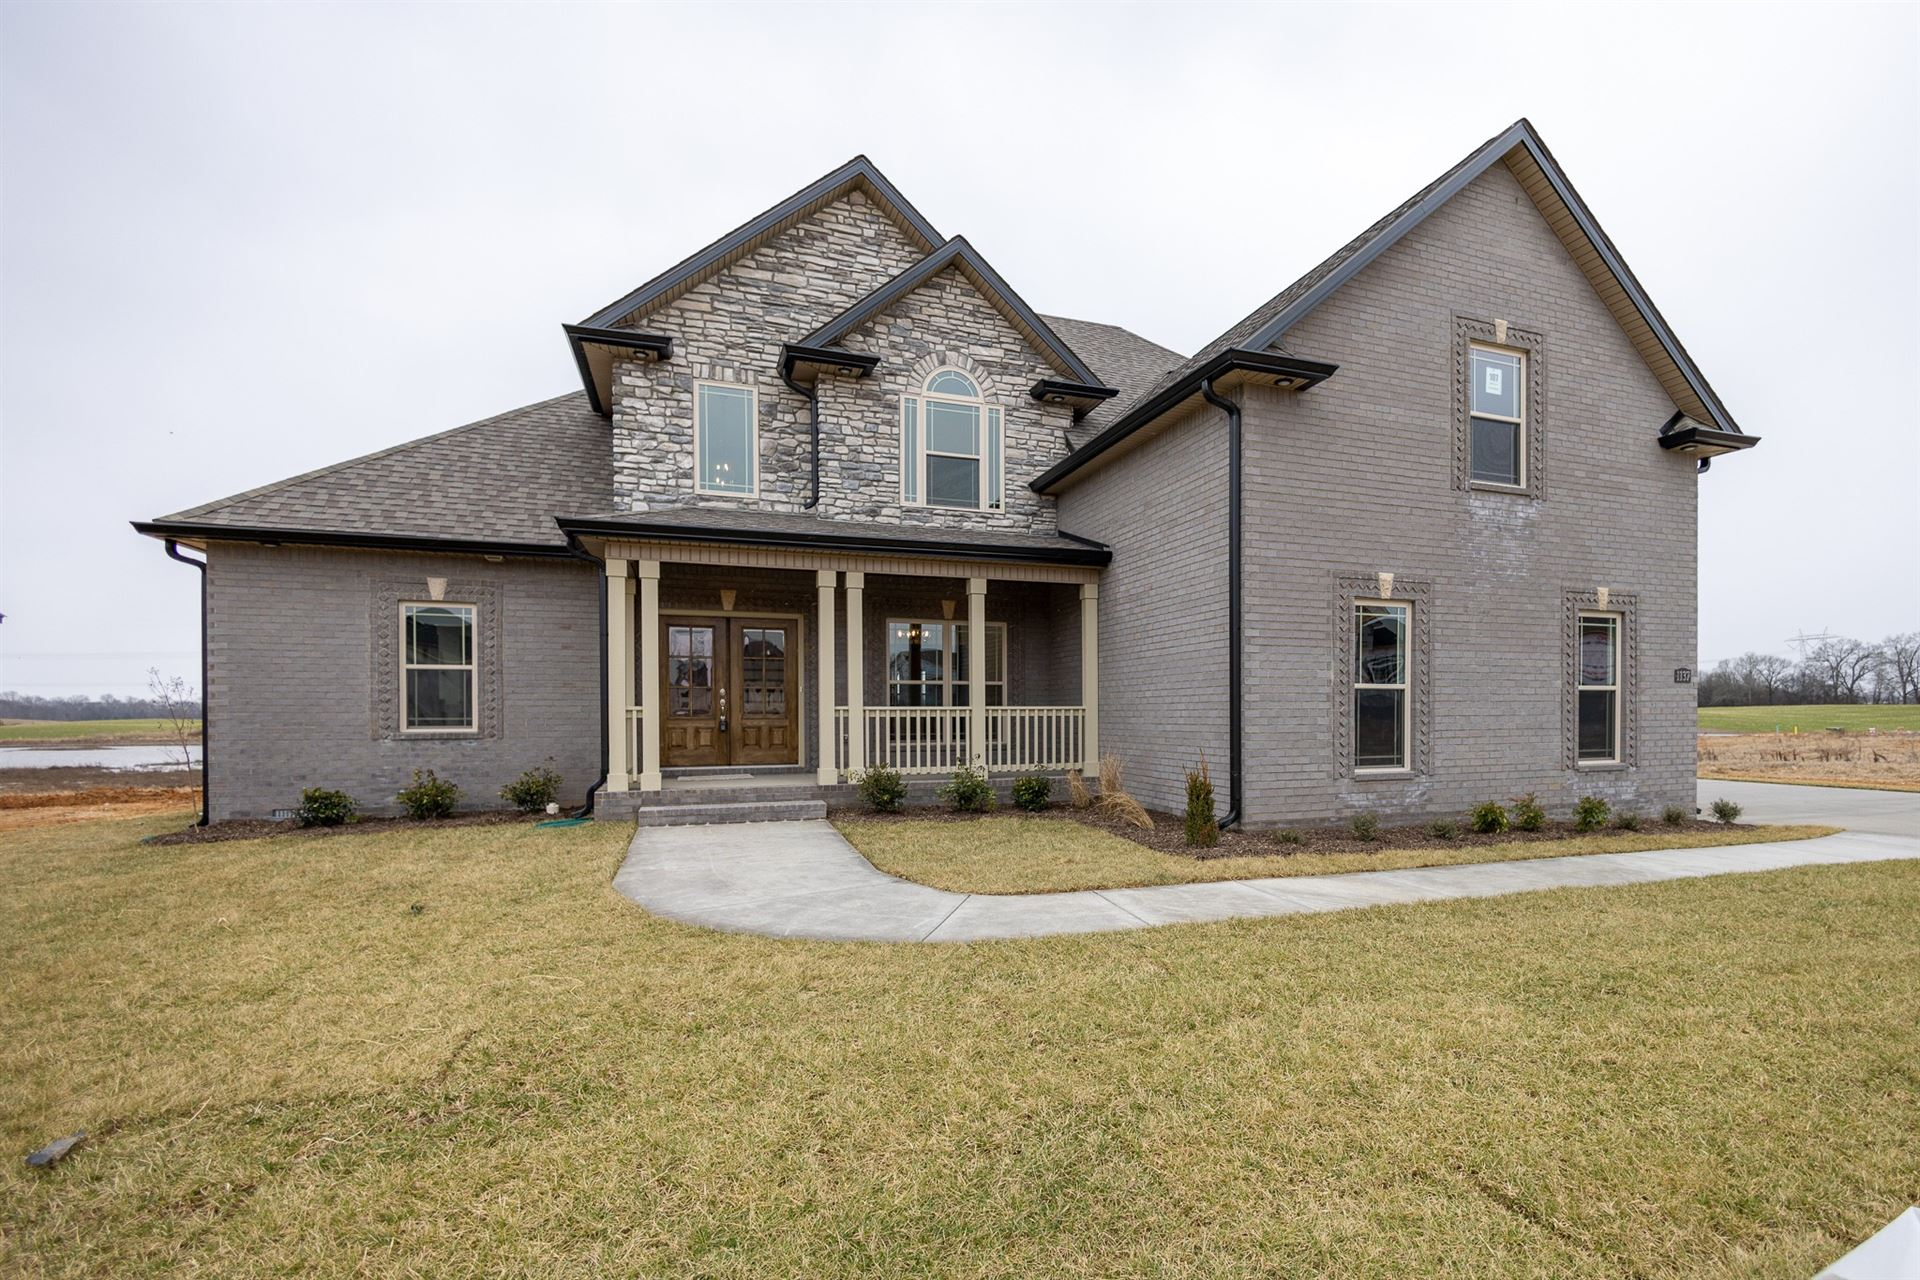 107 Hartley Hills, Clarksville, TN 37043 - MLS#: 2292251